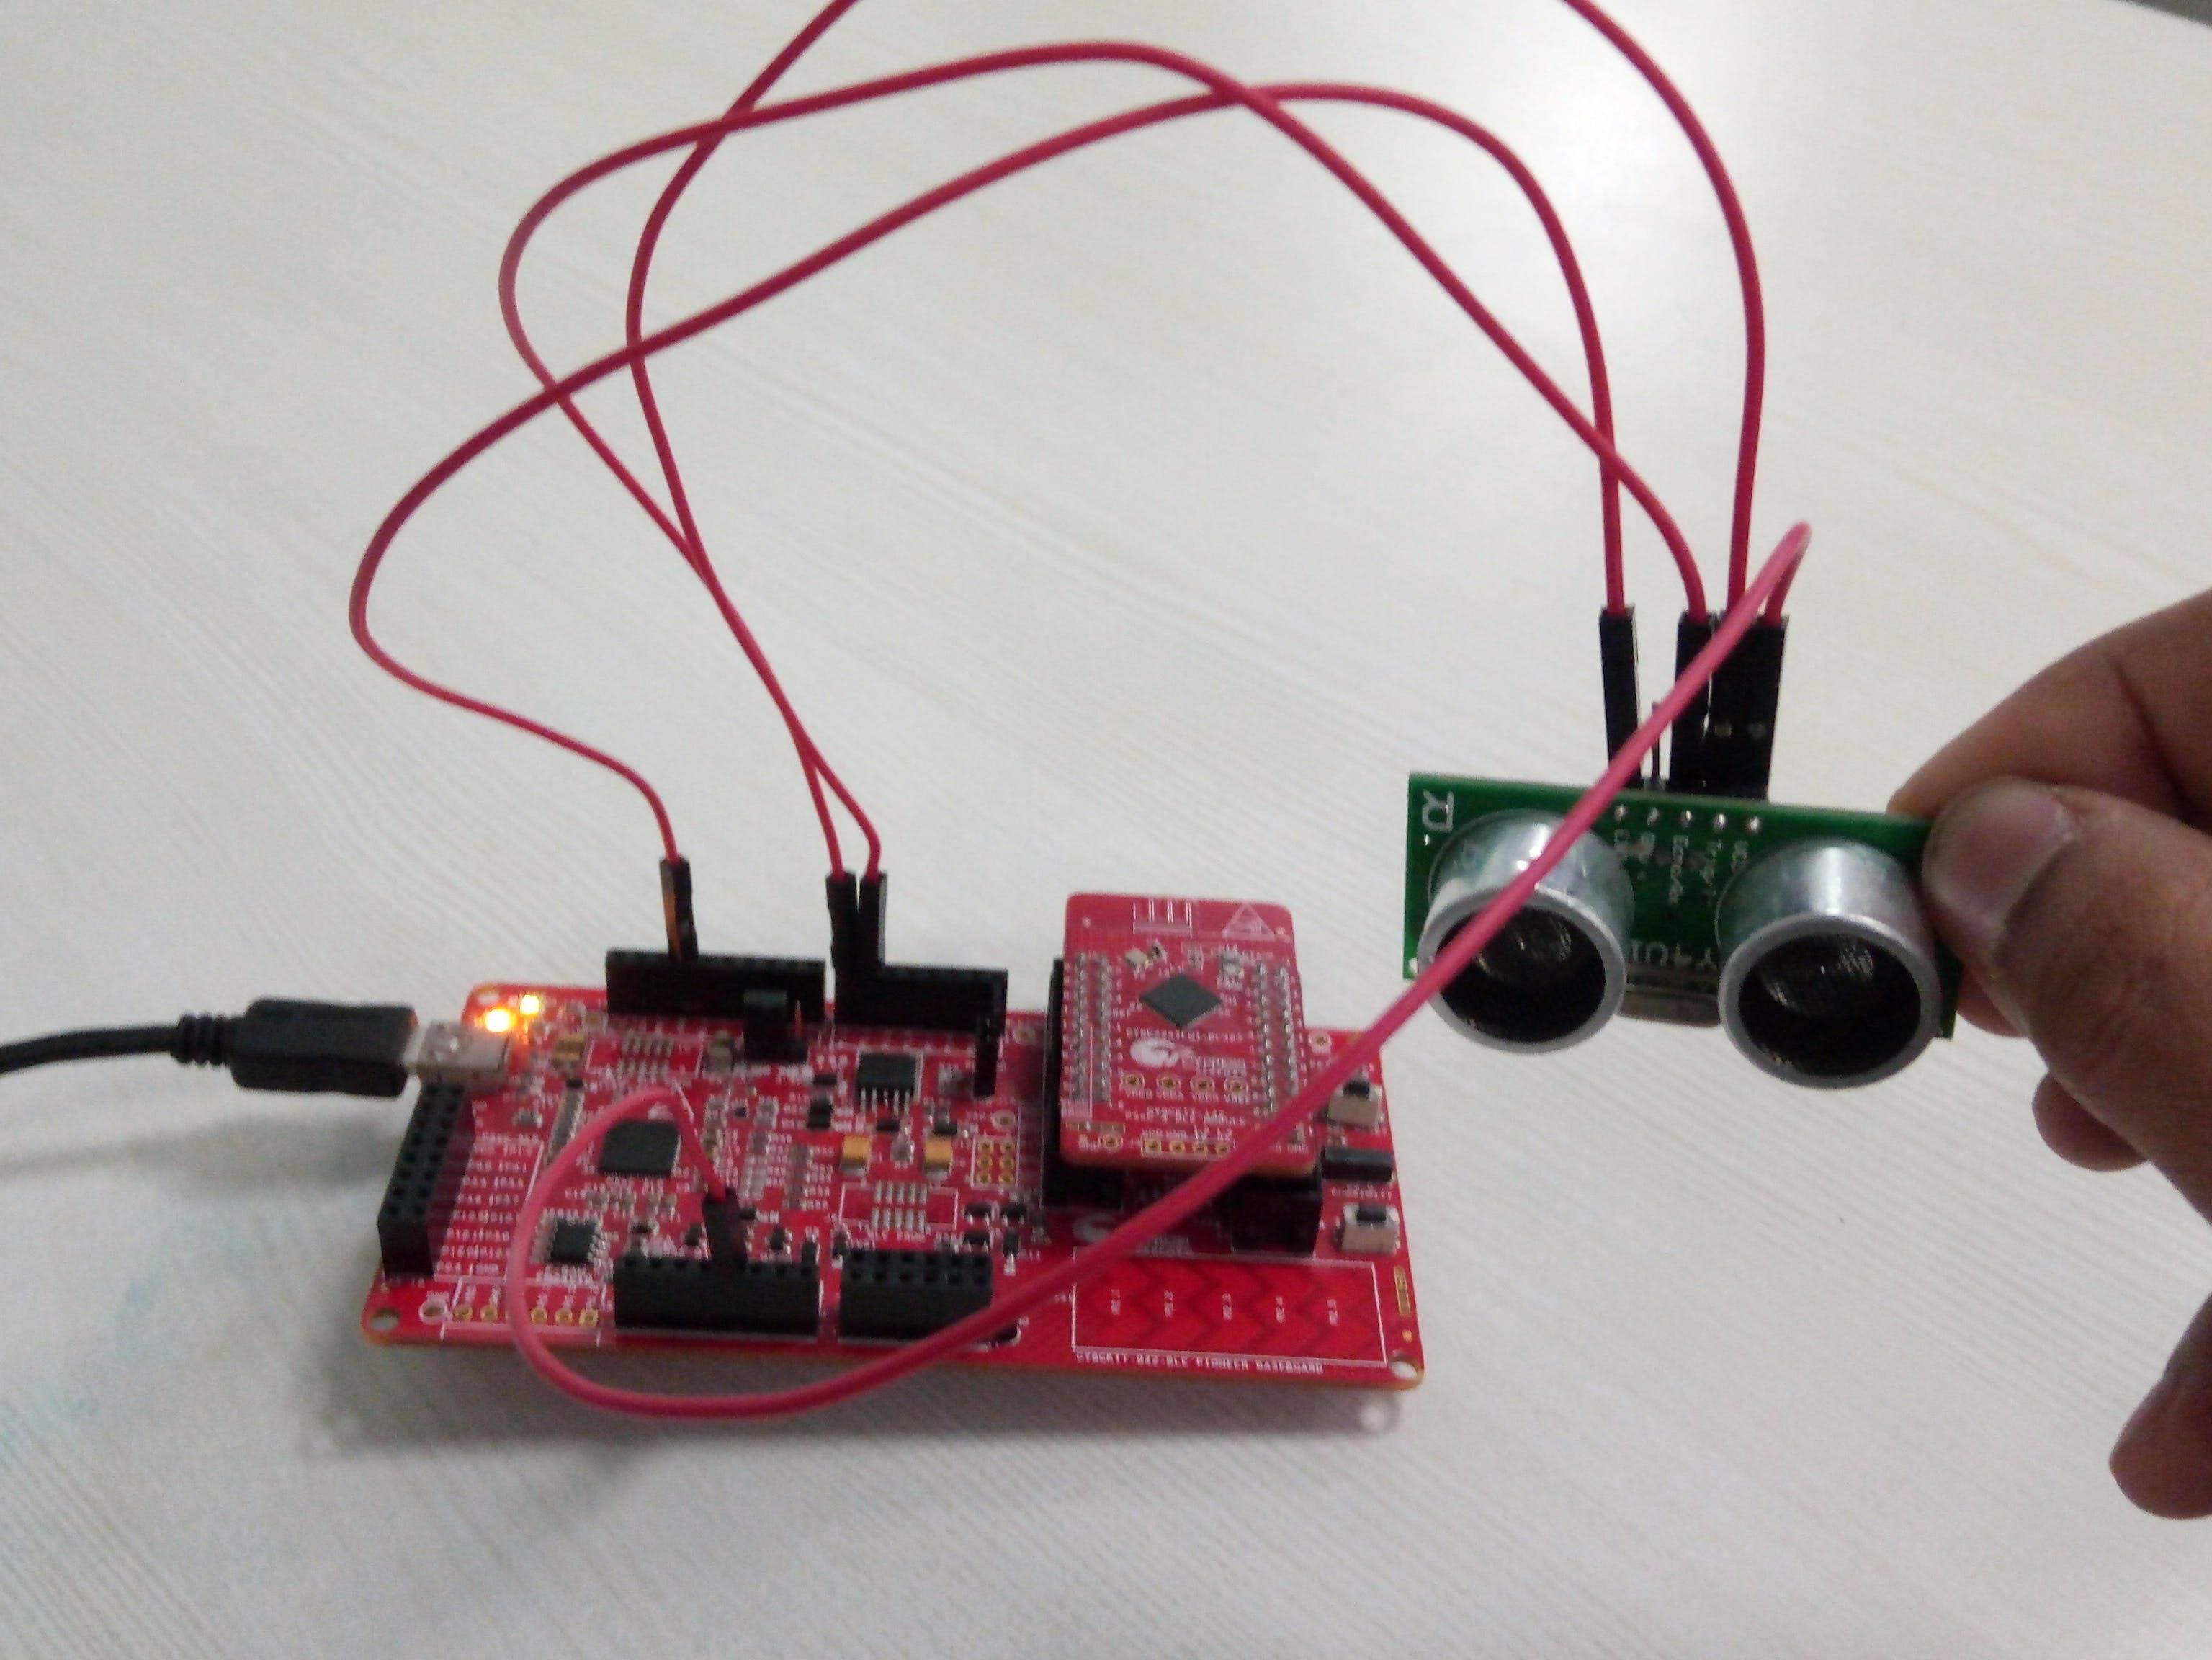 Measuring Distance With US-100 Ultrasonic Sensor